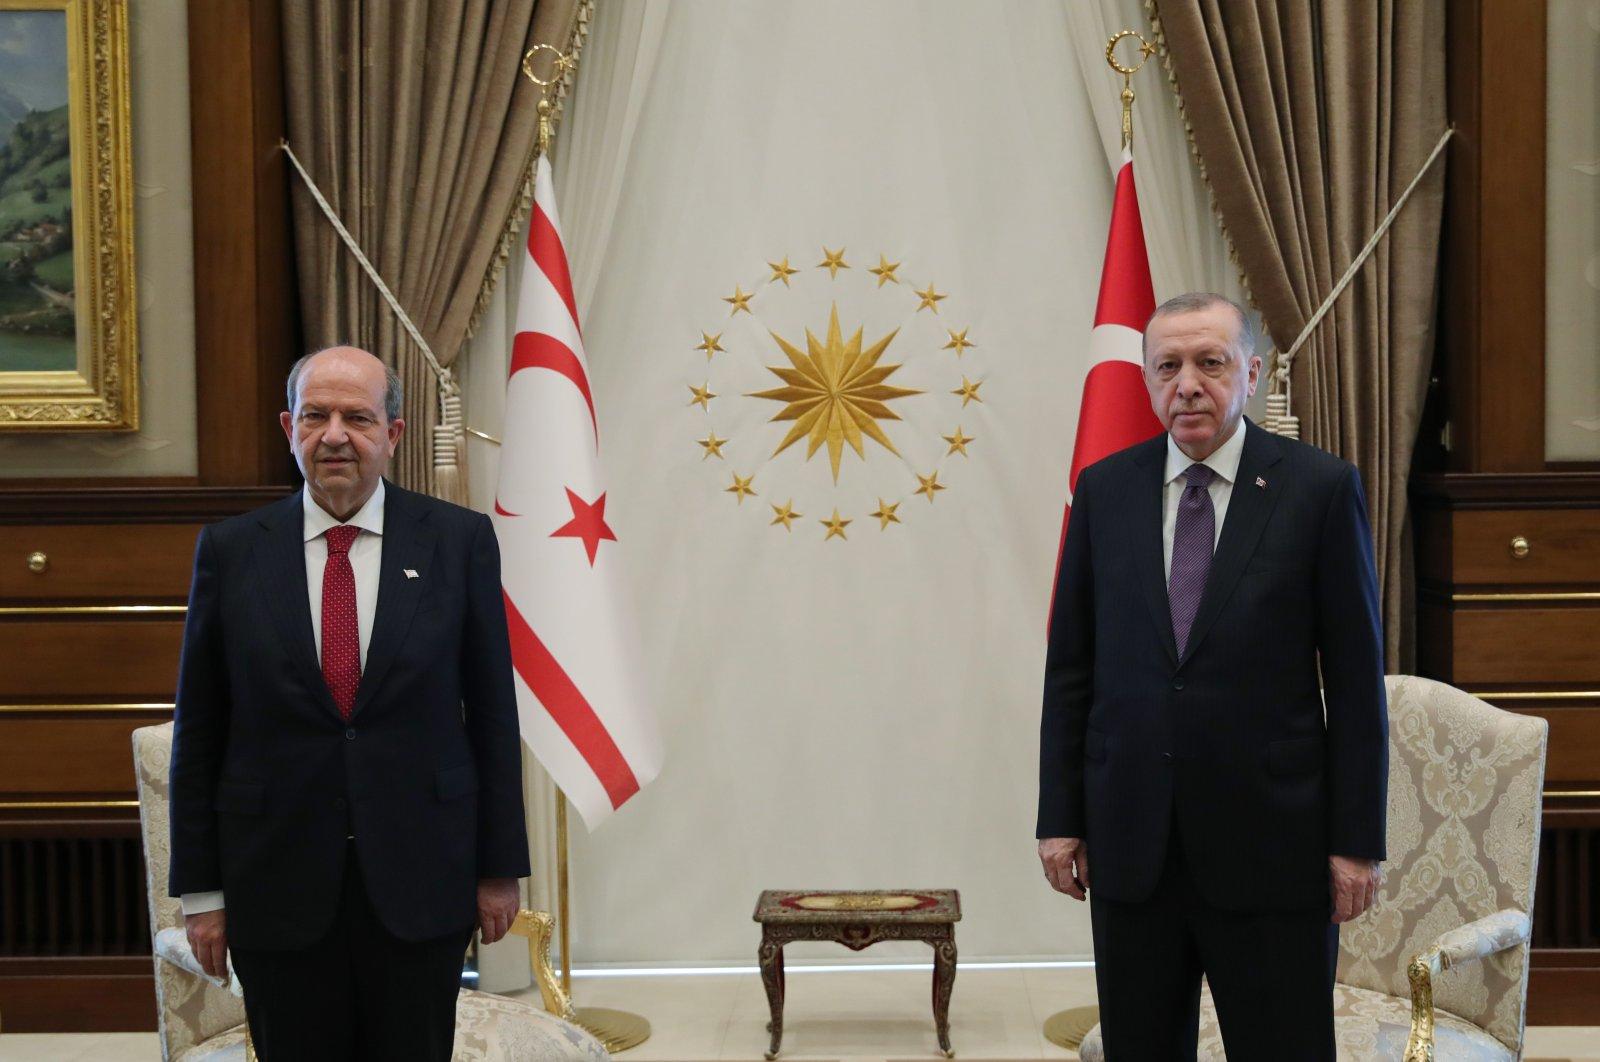 Turkish Republic of Northern Cyprus President Ersin Tatar (L) and President Recep Tayyip Erdoğan pose before a bilateral meeting, Ankara, Turkey, April 26, 2021. (AA Photo)